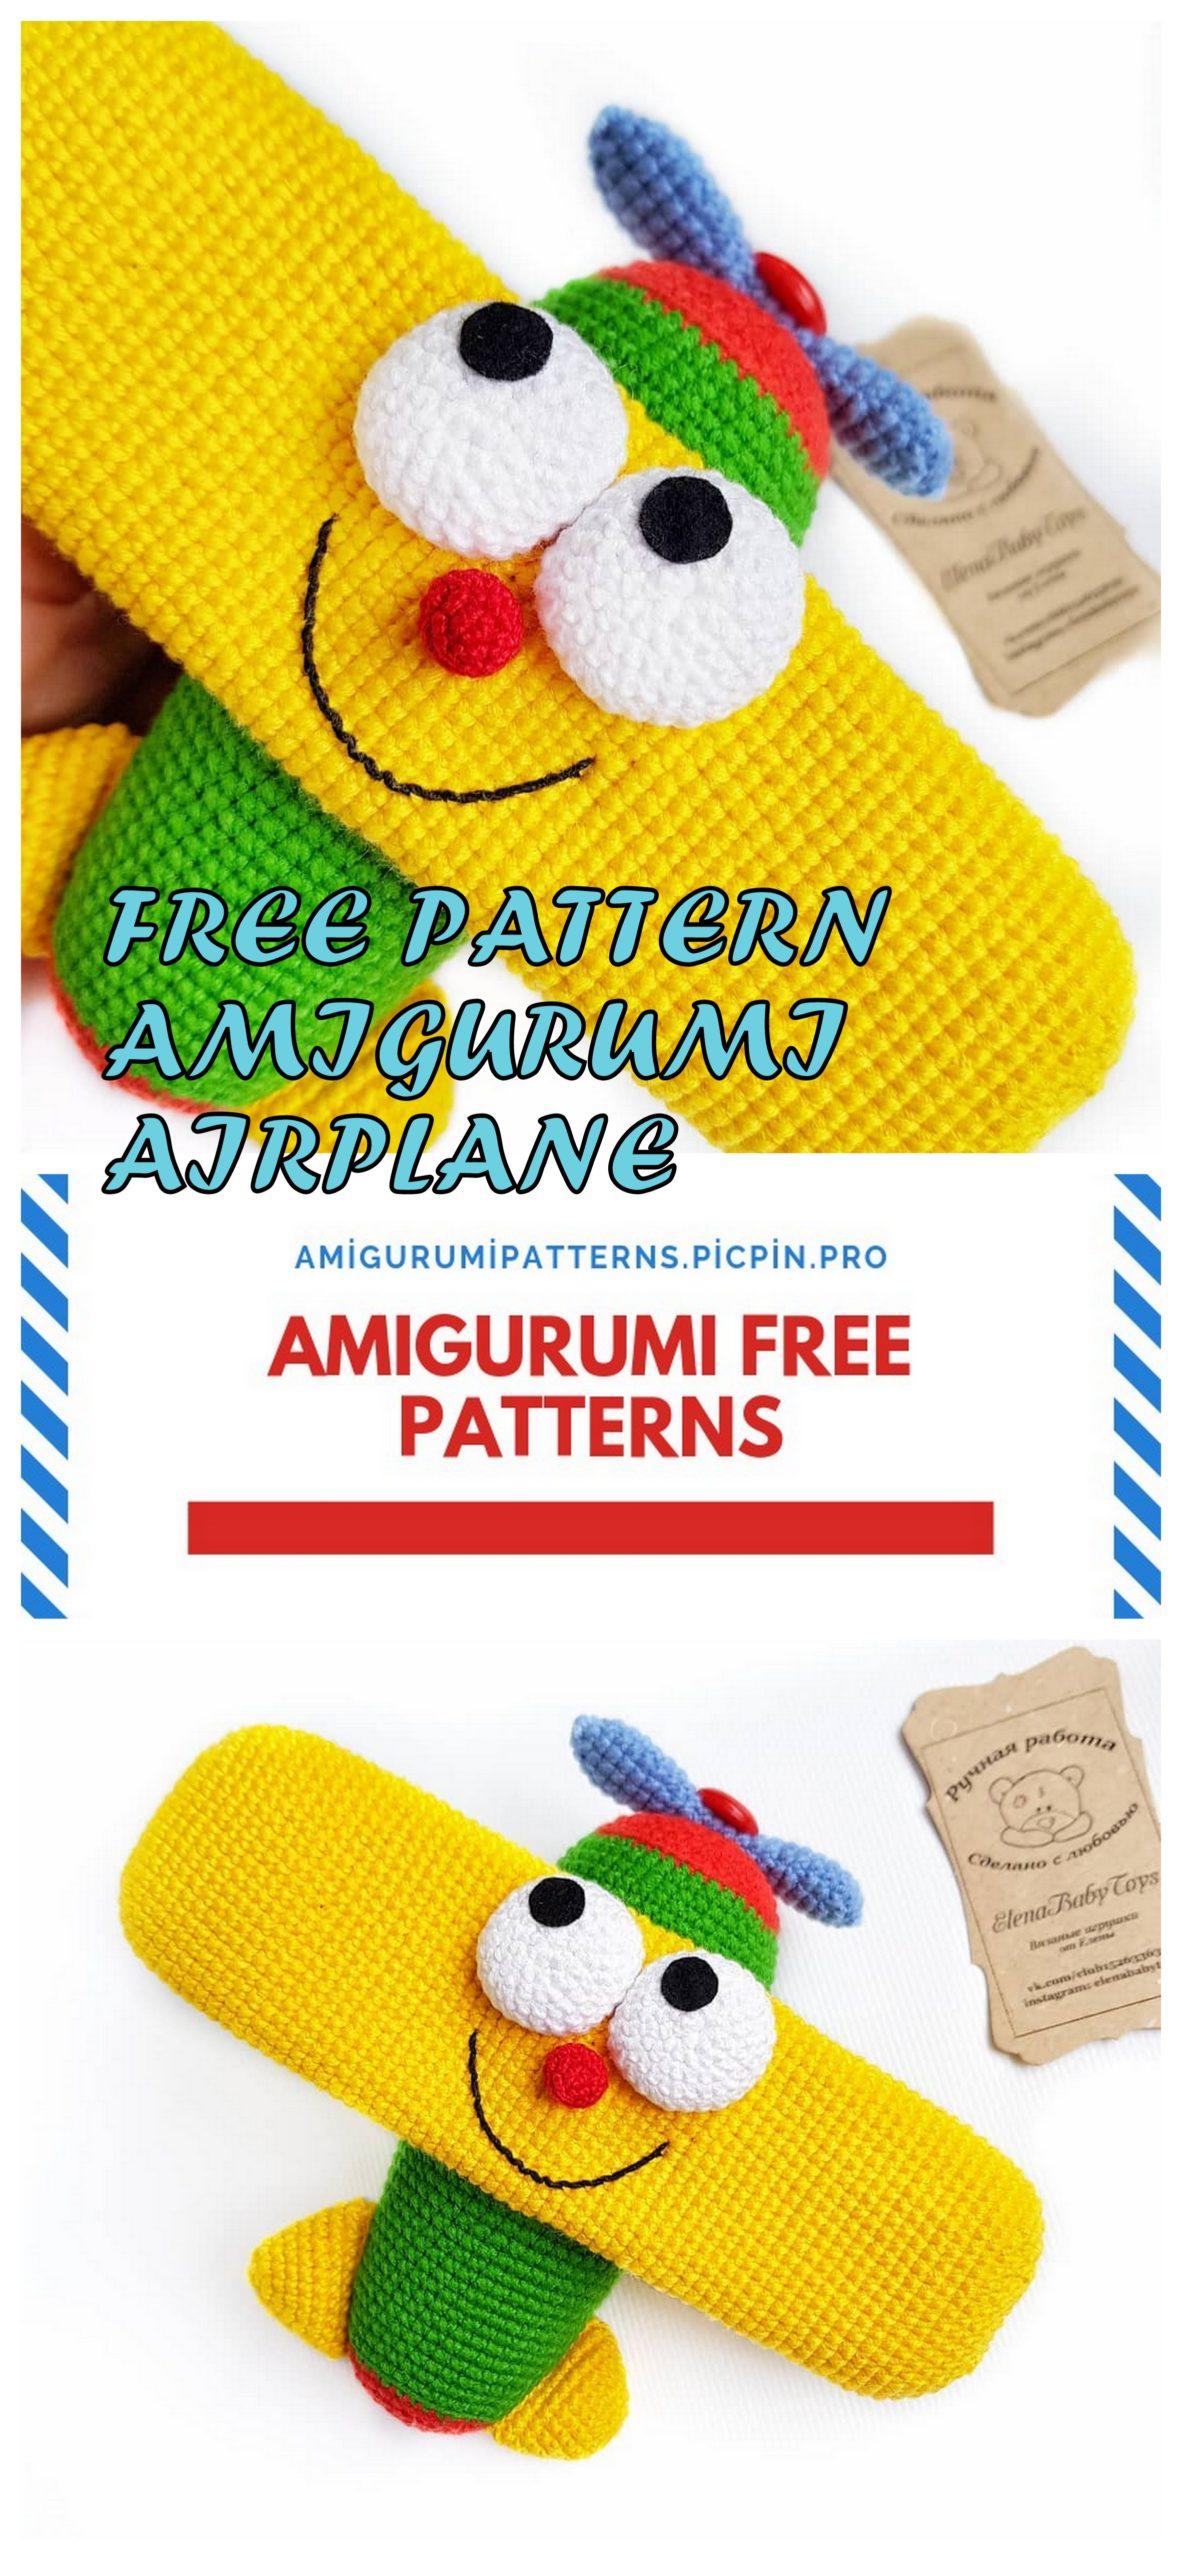 Cartoon airplane crochet pattern - Amigurumi Today | 2560x1182